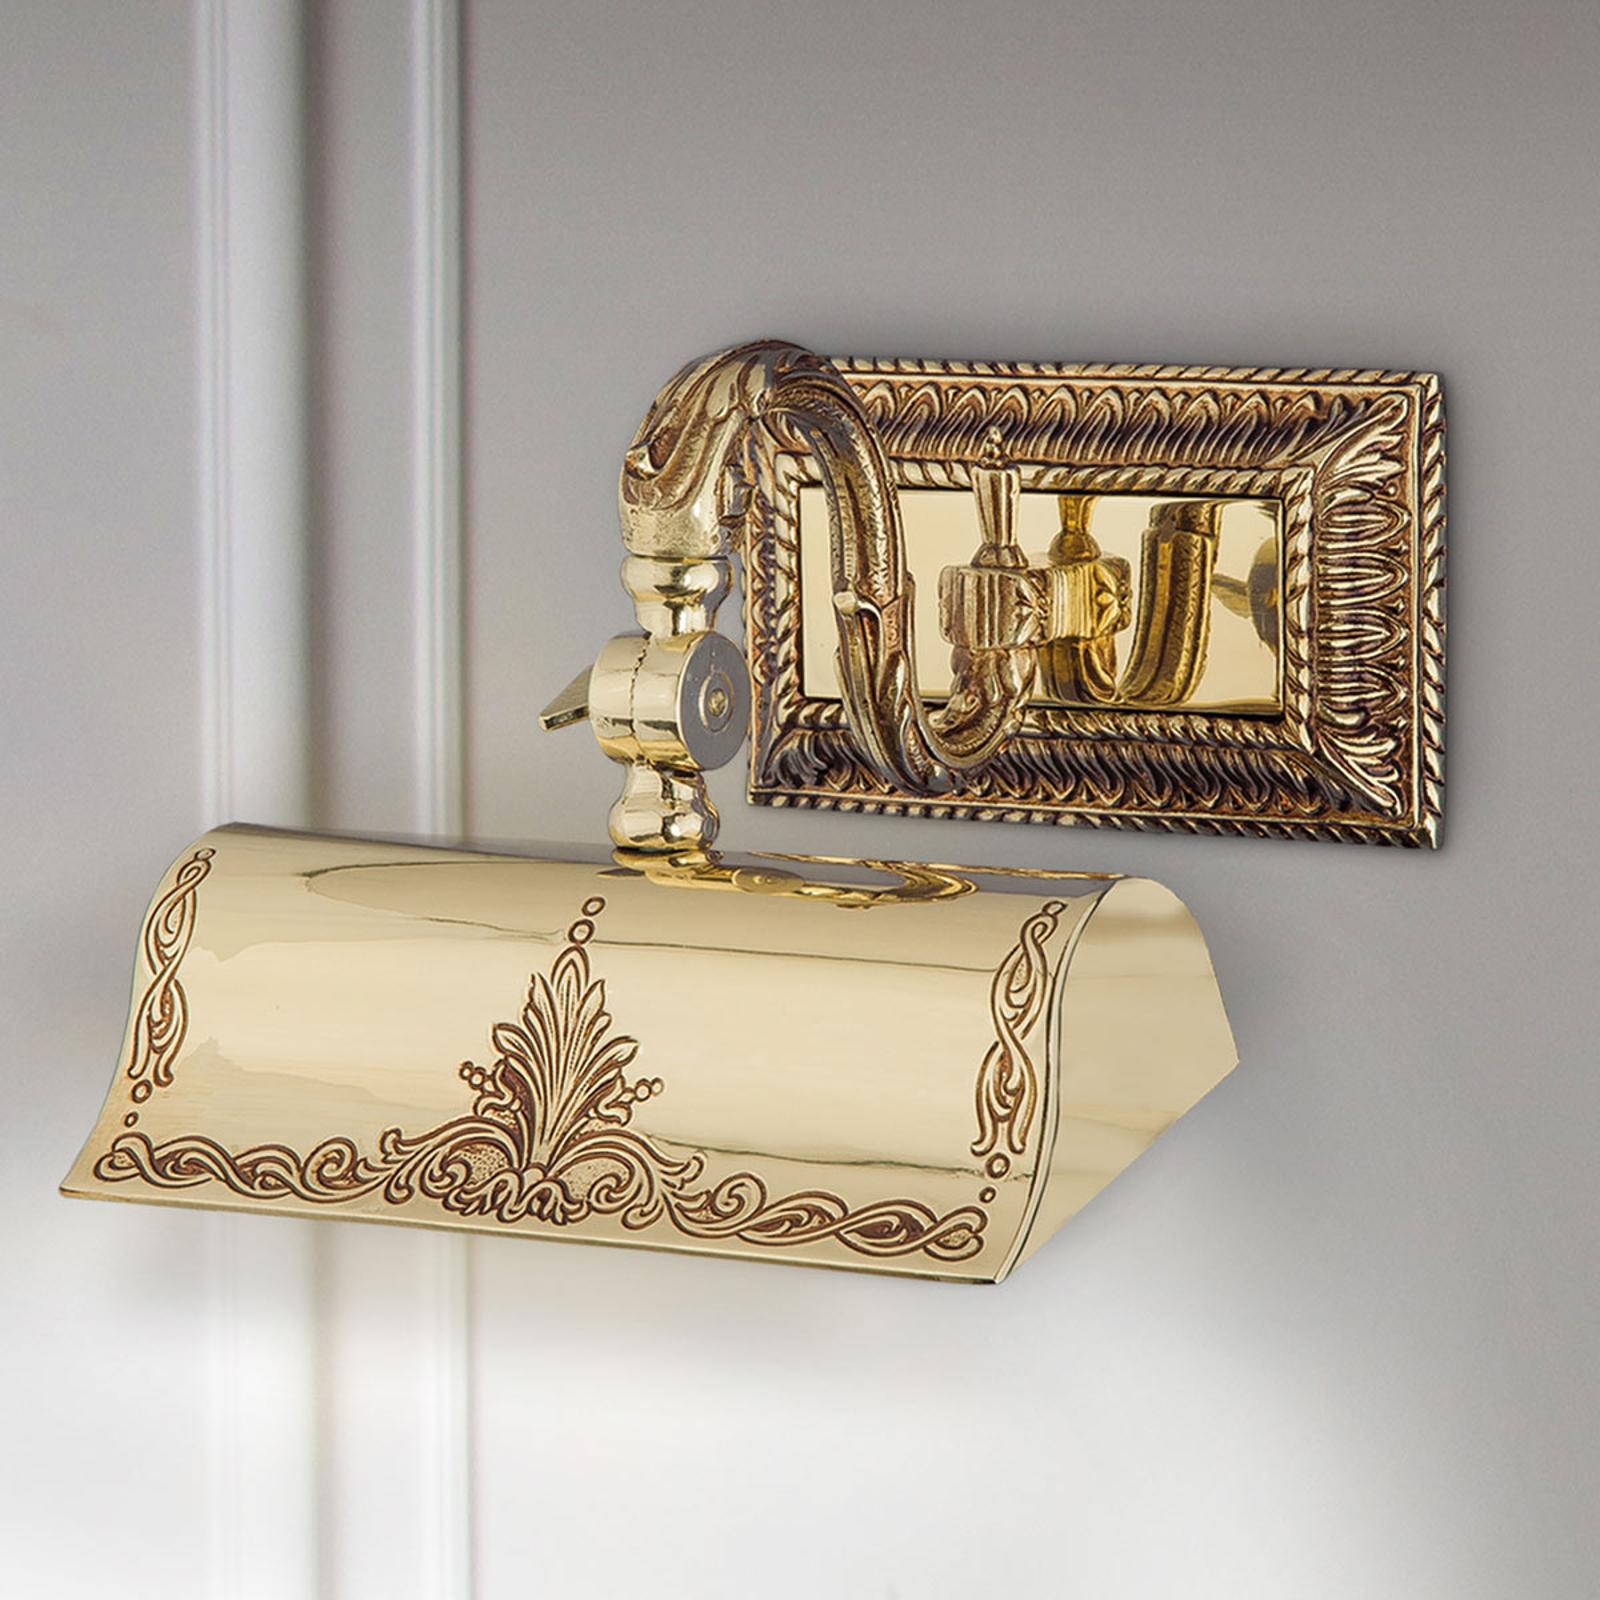 Tavelbelysning Capitel guld patinerad 20 cm